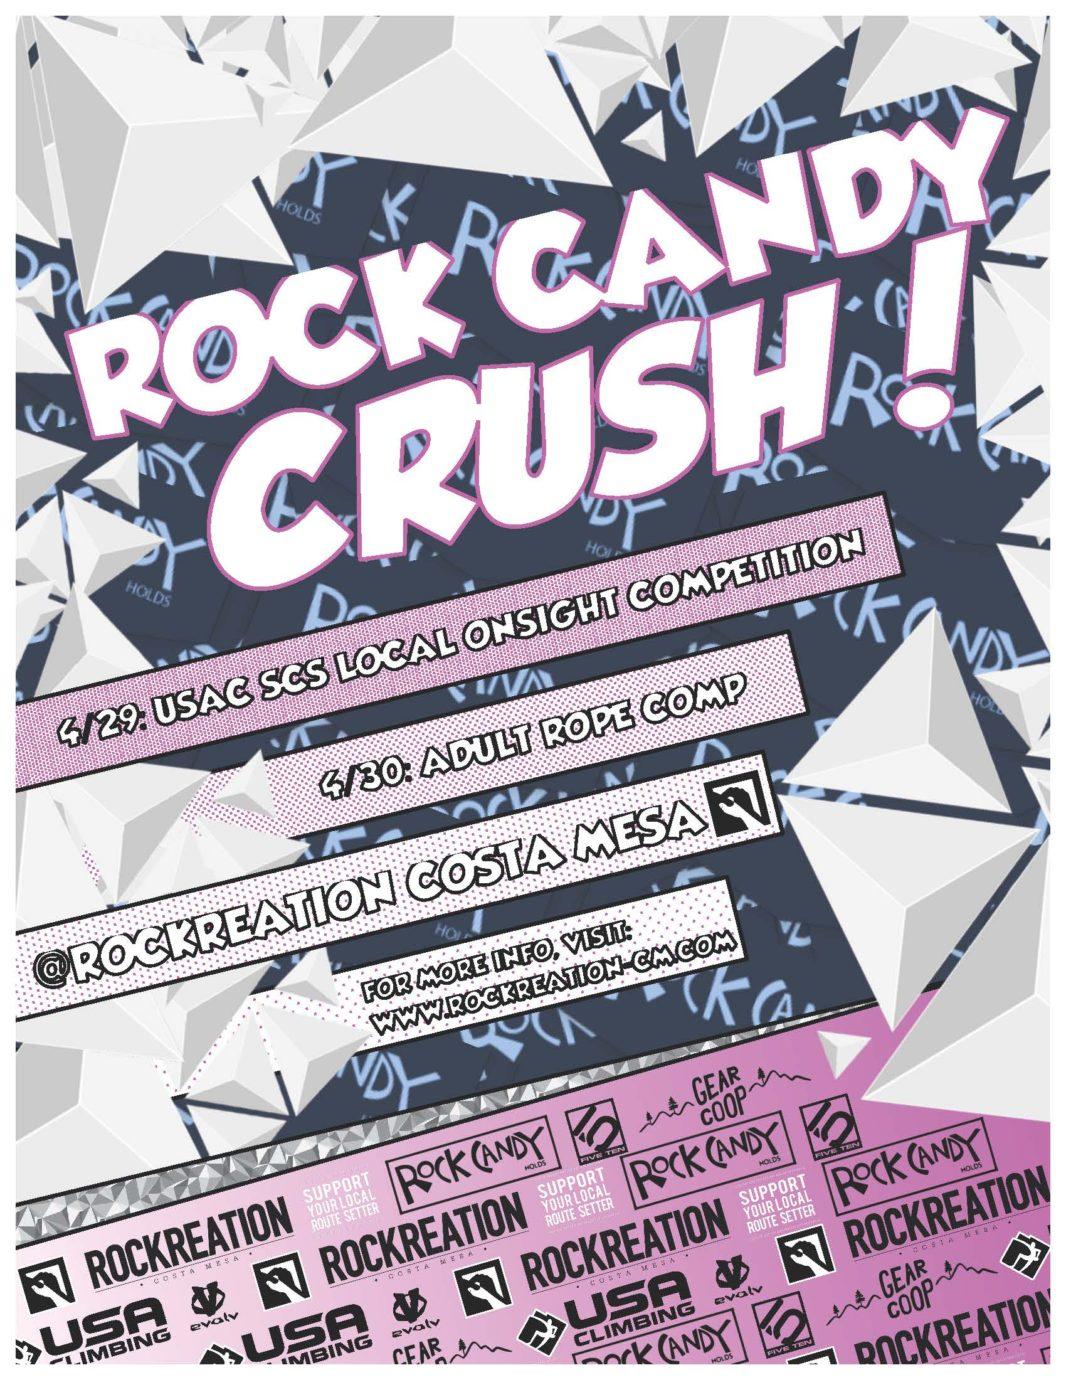 RockCandyCrush